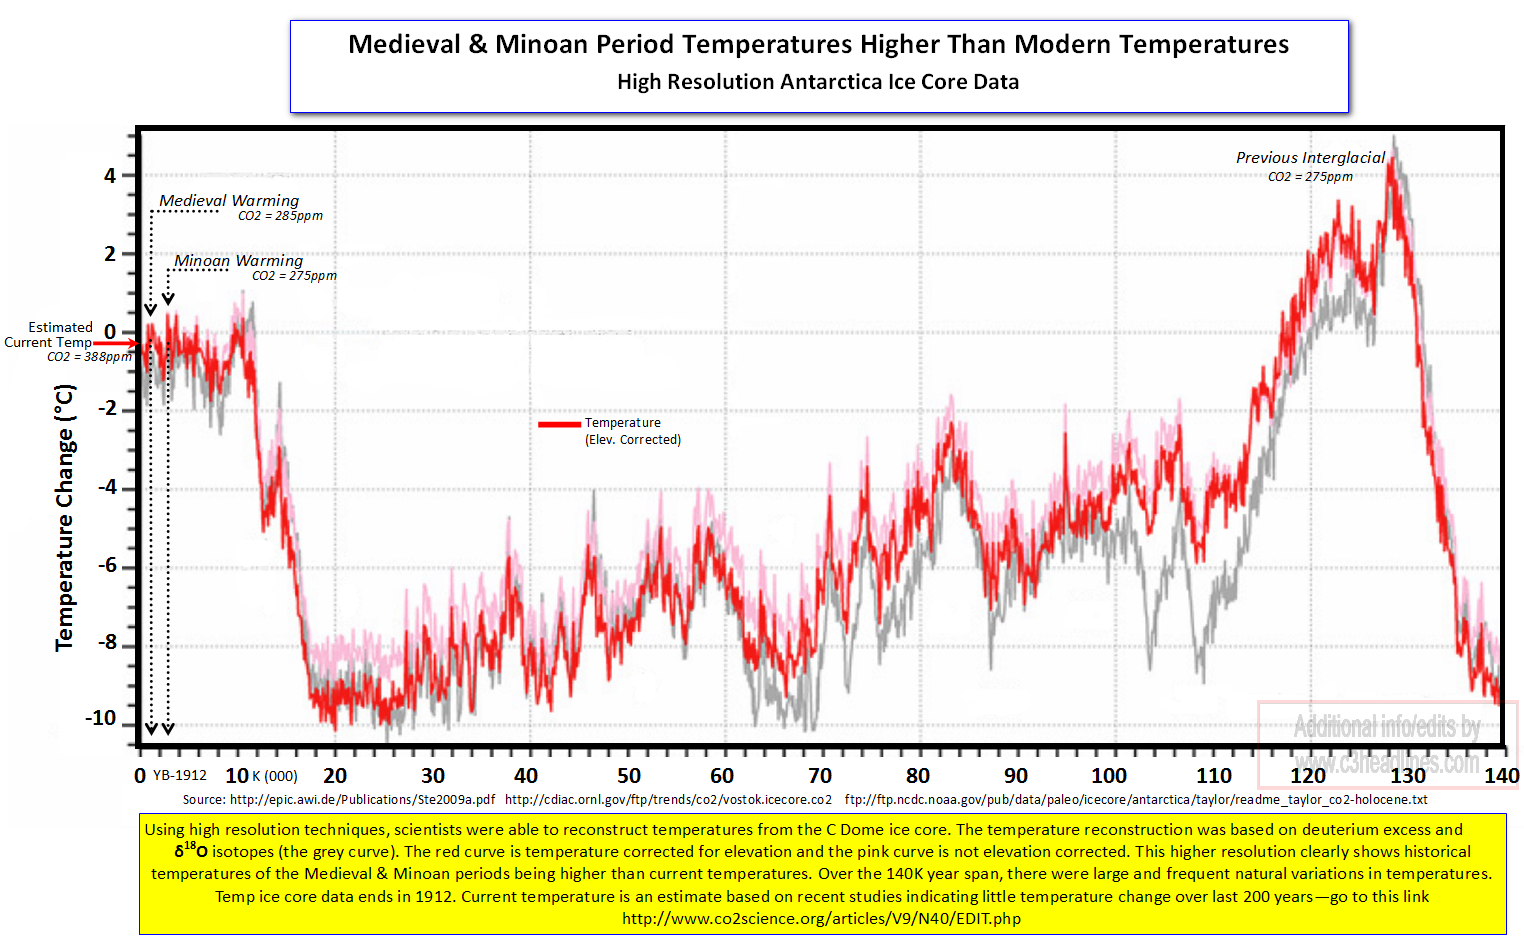 Anarctica High Resolution Ice core Temp Data